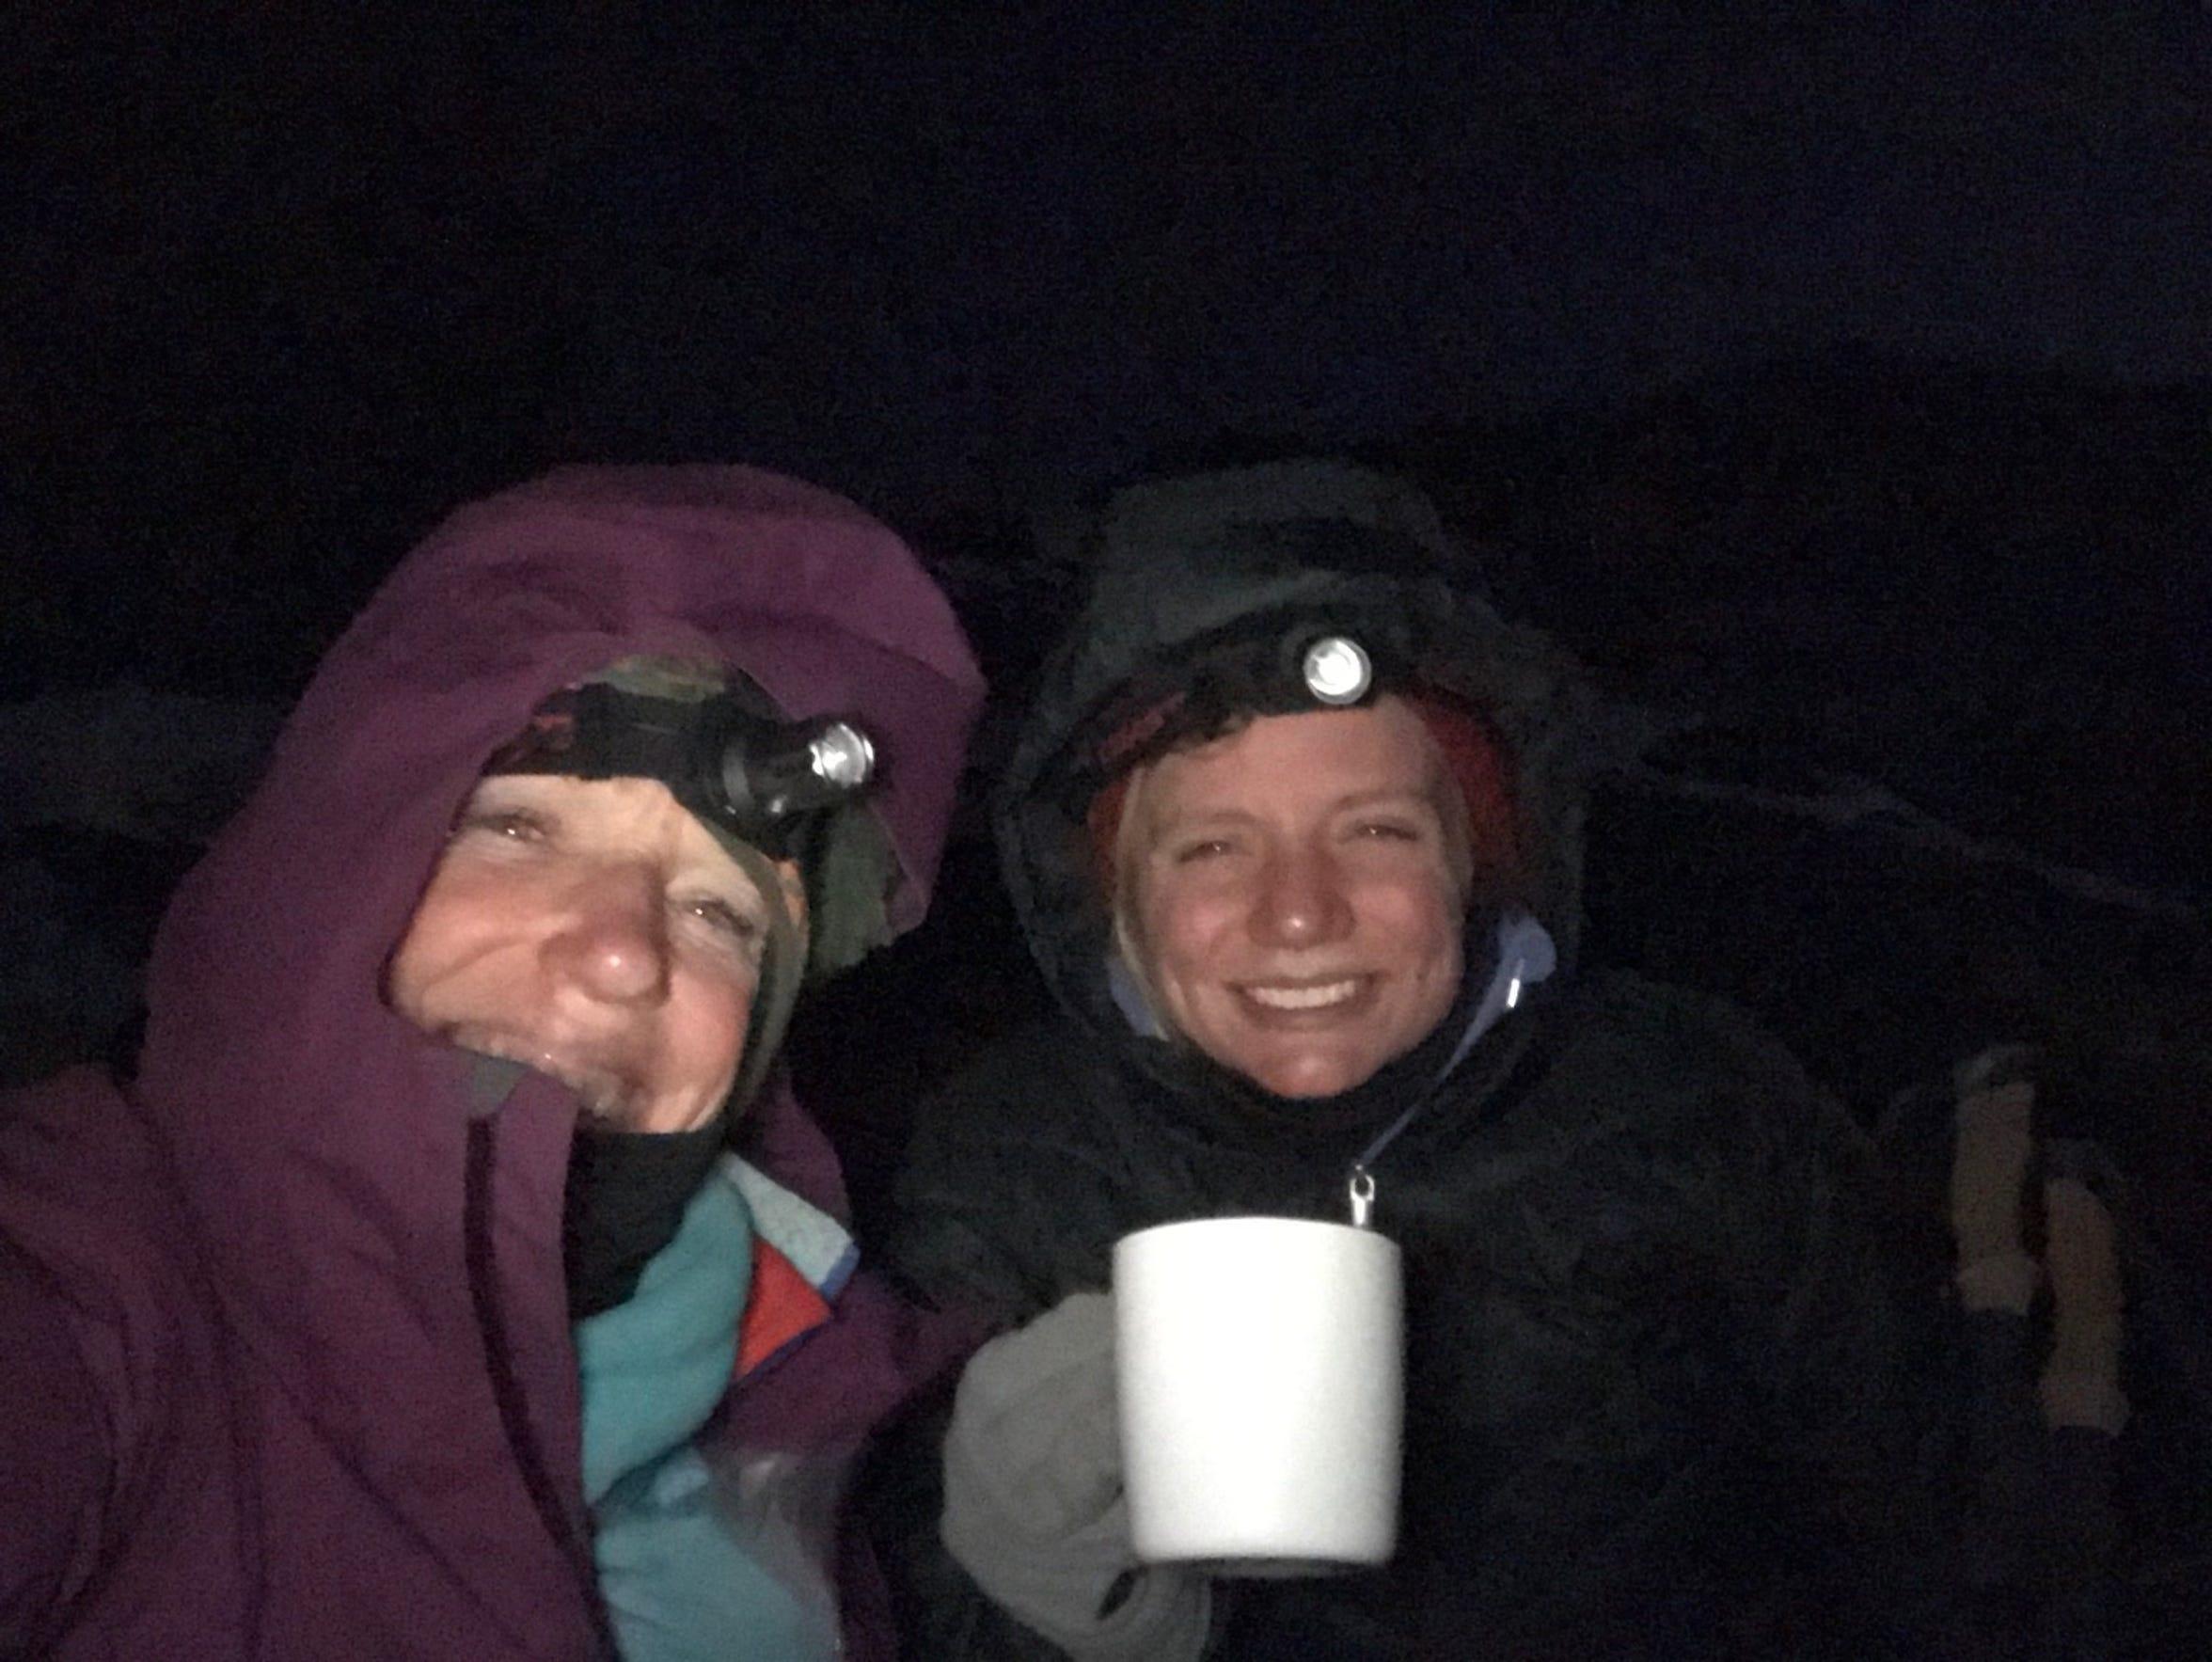 Kirby Adams and Jordan Grantz 45 minutes from summit of Mount Kilimanjaro, Tanzania